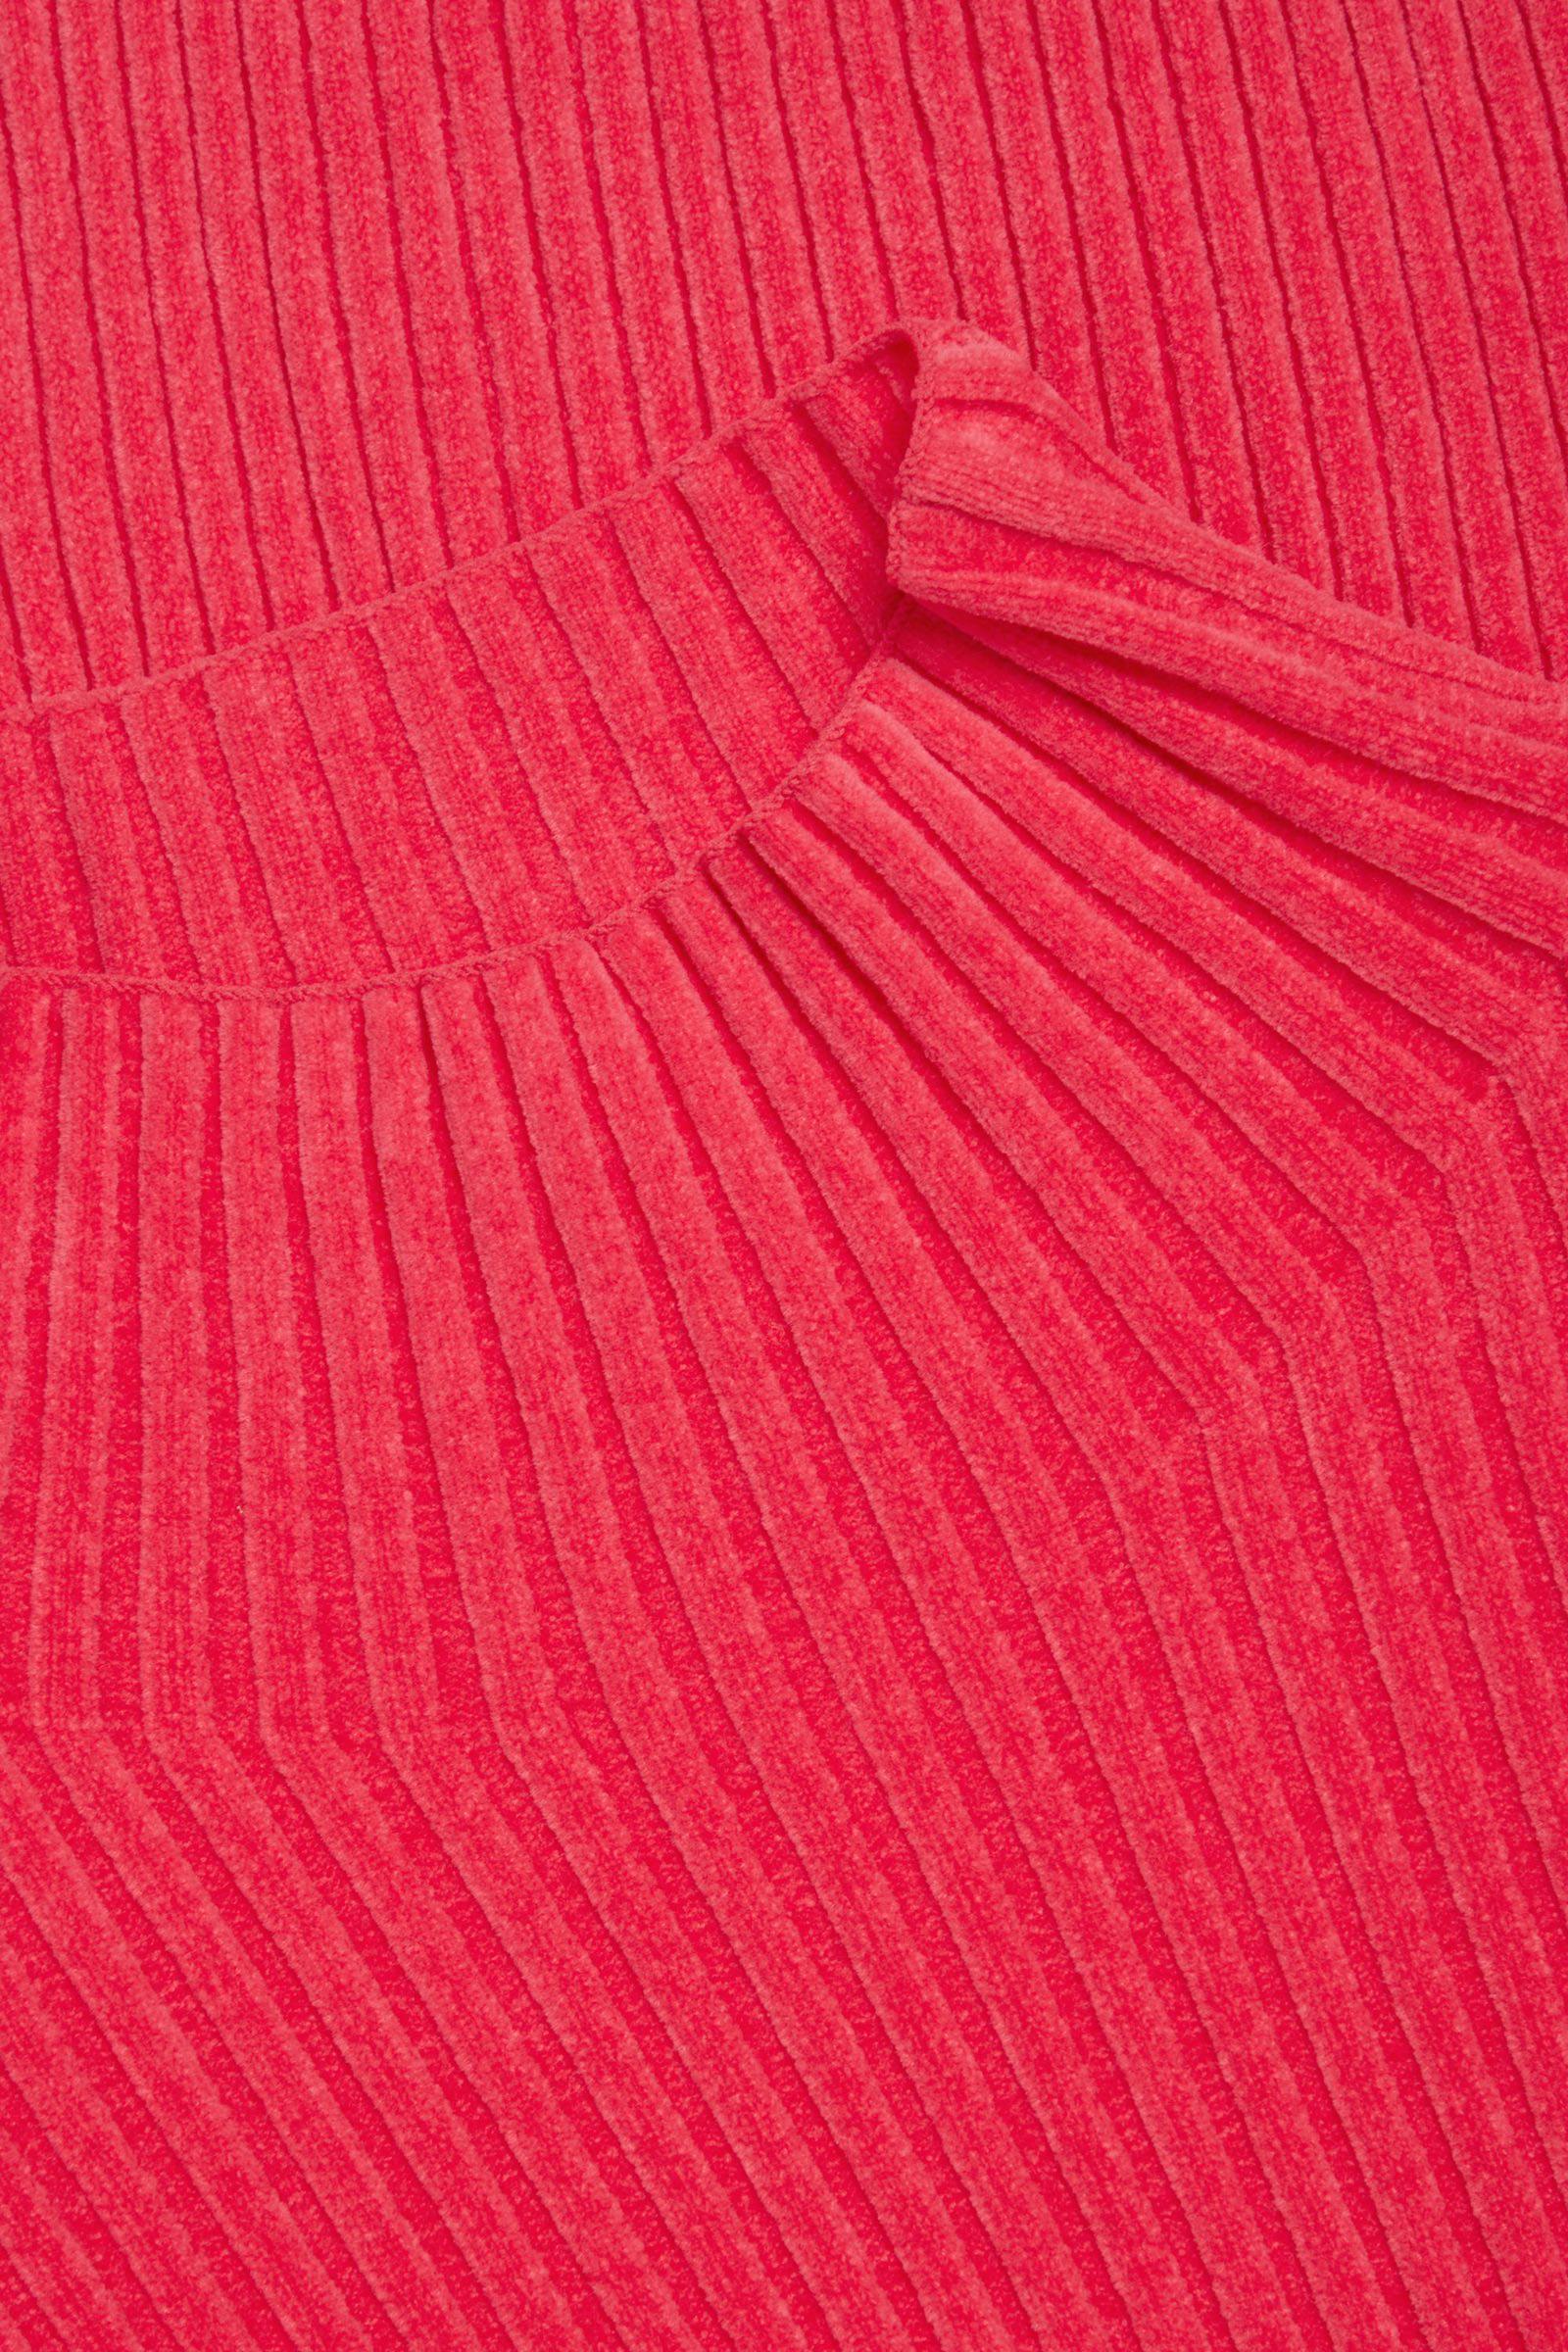 COS 리브 오가닉 코튼 탑의 핑크컬러 Detail입니다.